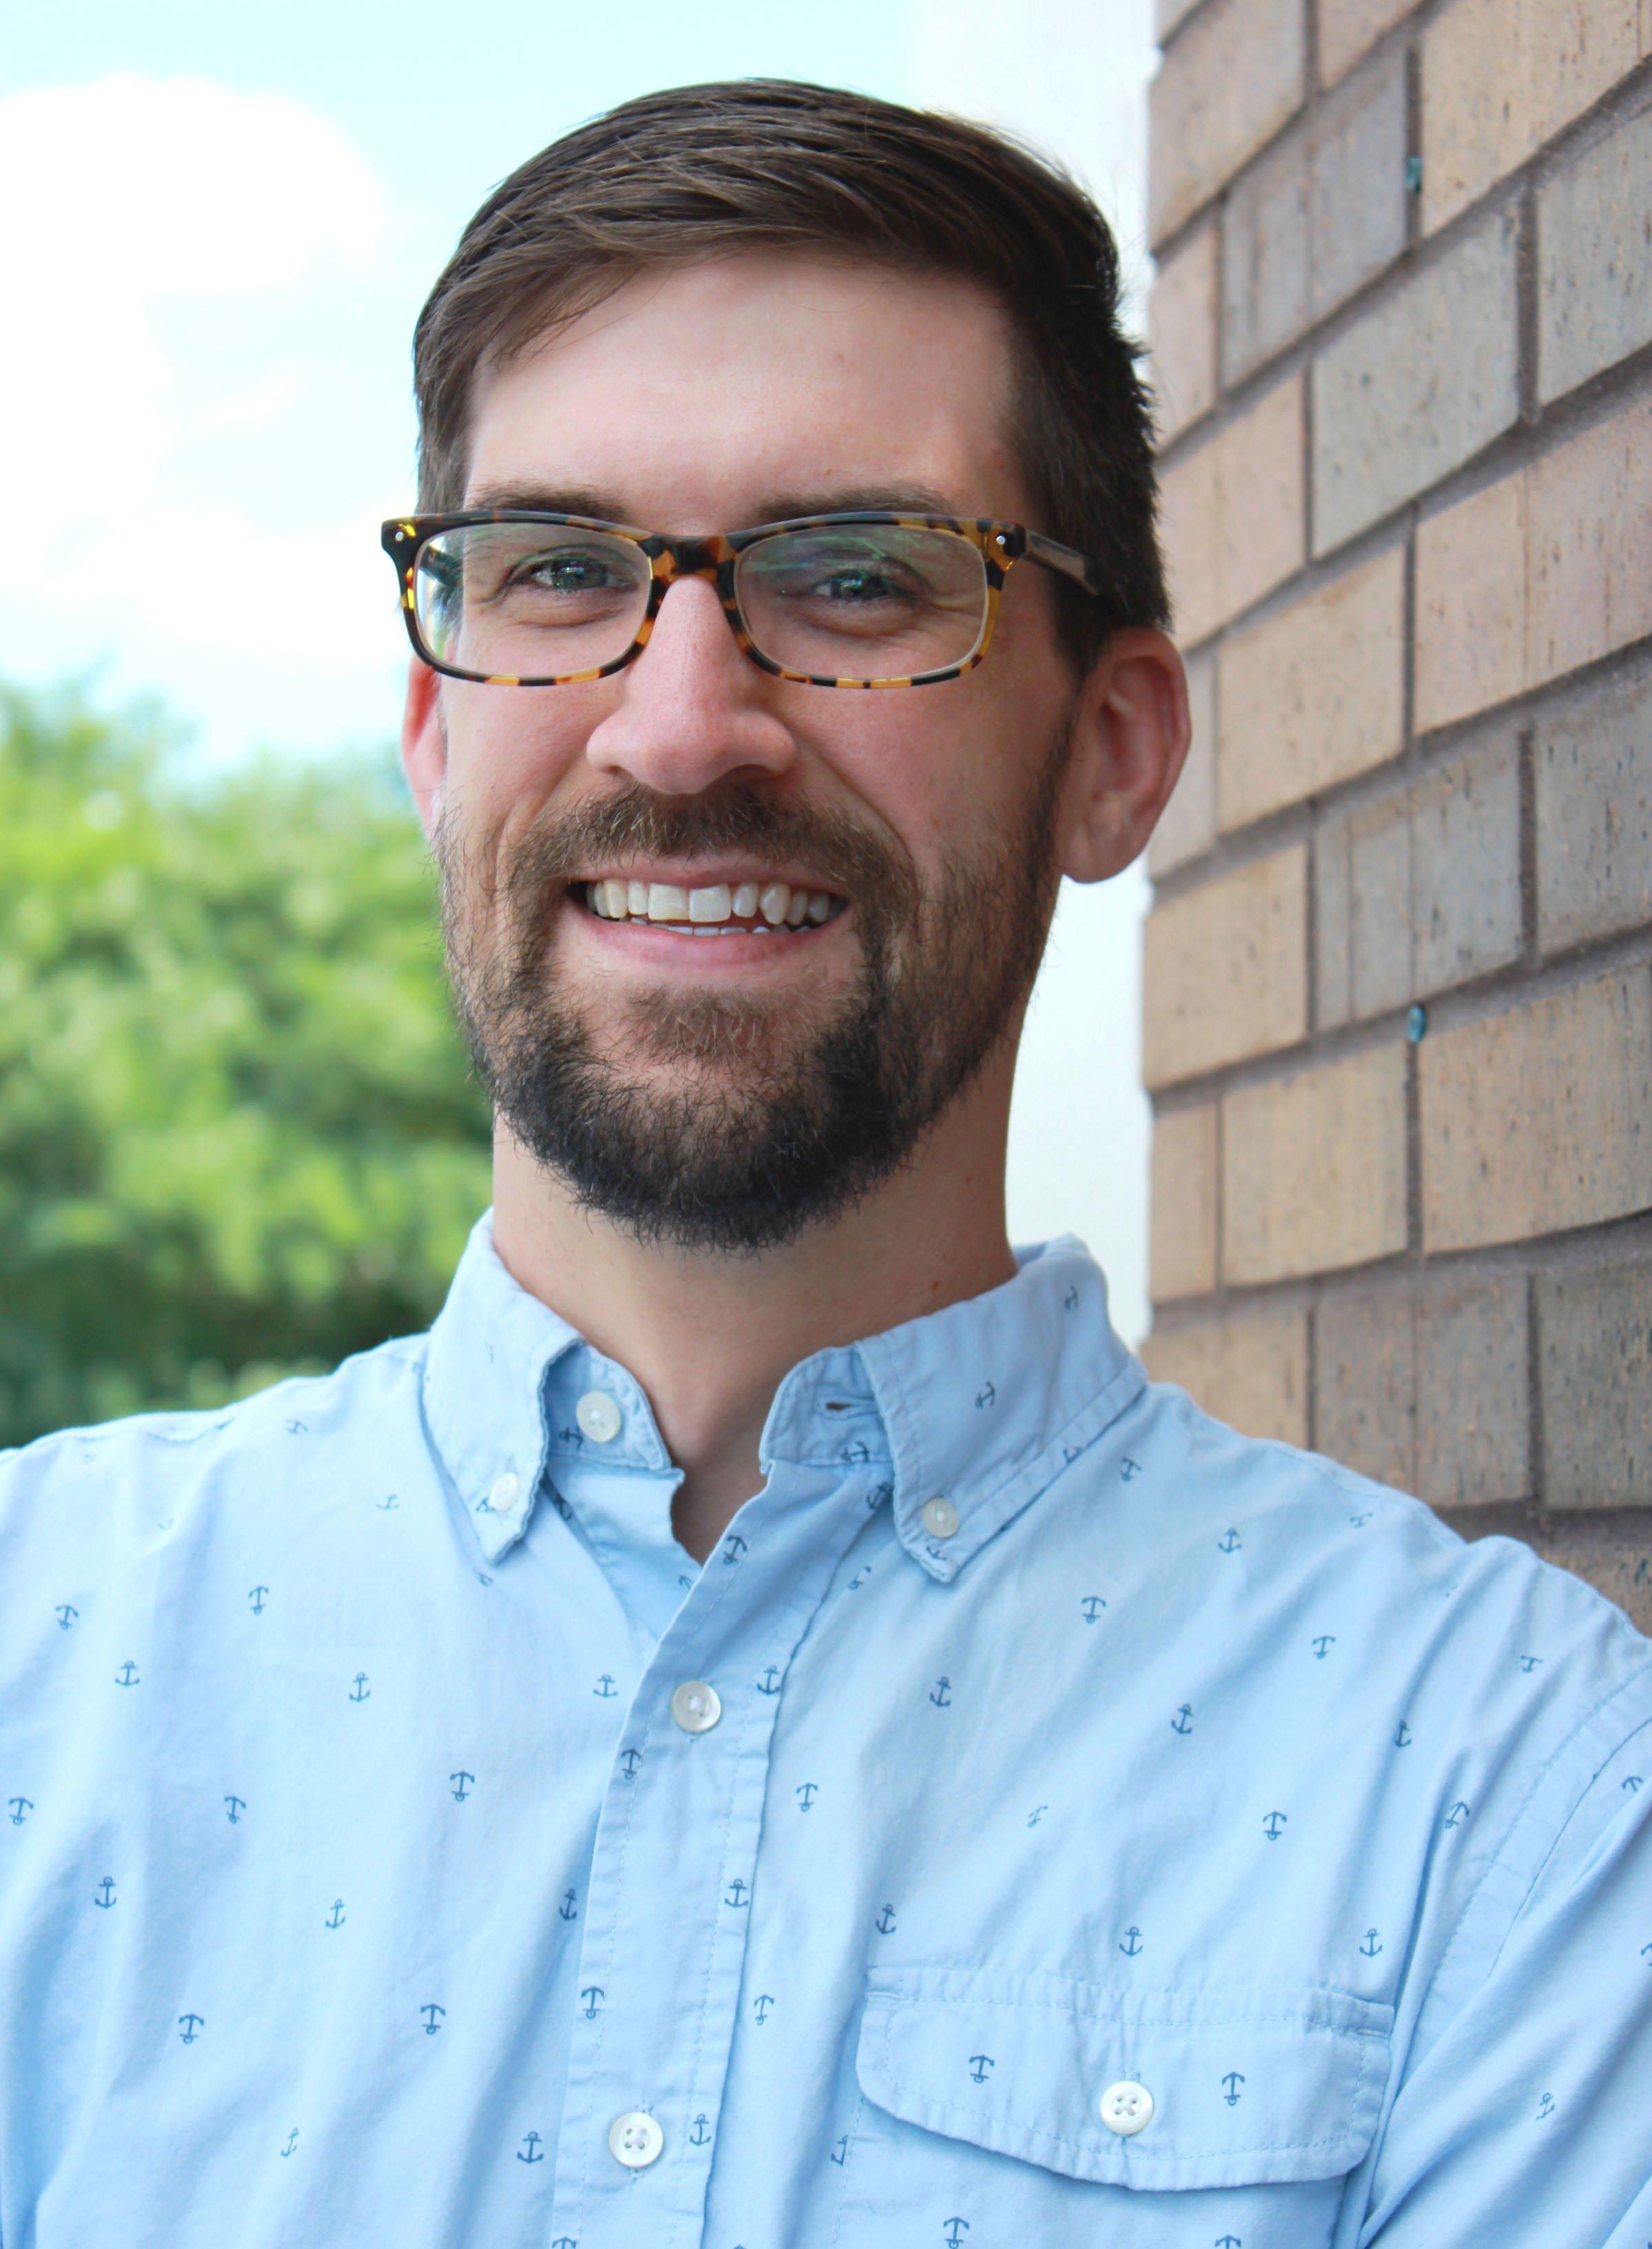 Jeff Mares